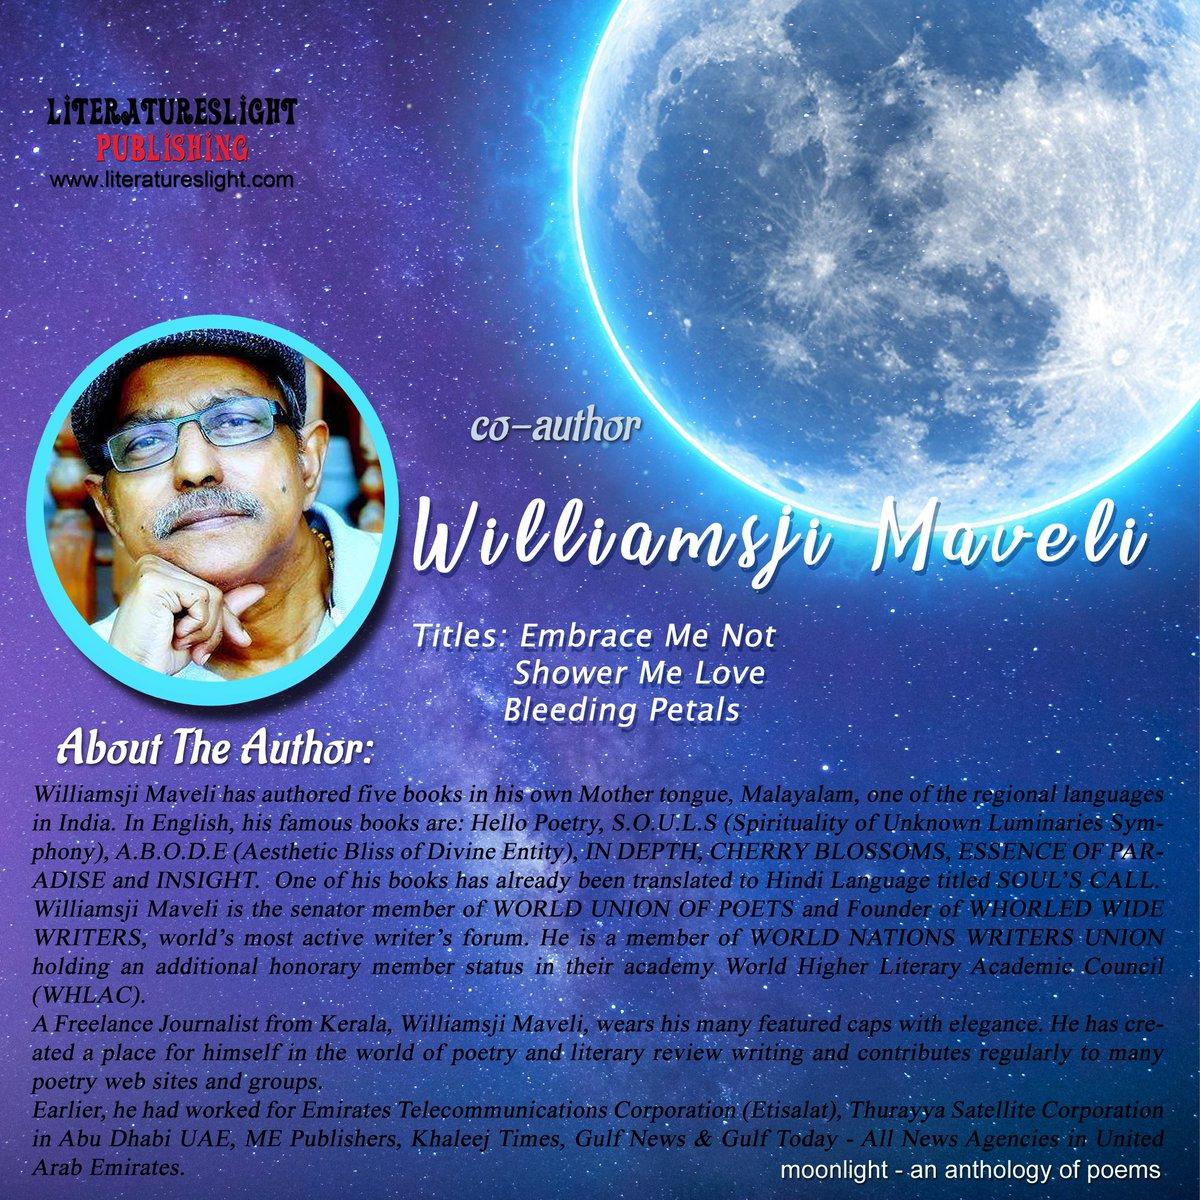 #literatureslight #poetryanthology #moonlight  Thank you for the contribution Williamsji Maveli#poetry #booklovers #writeindia #newindianauthors #indianauthors #poetsofindia pic.twitter.com/046QkqOtdX